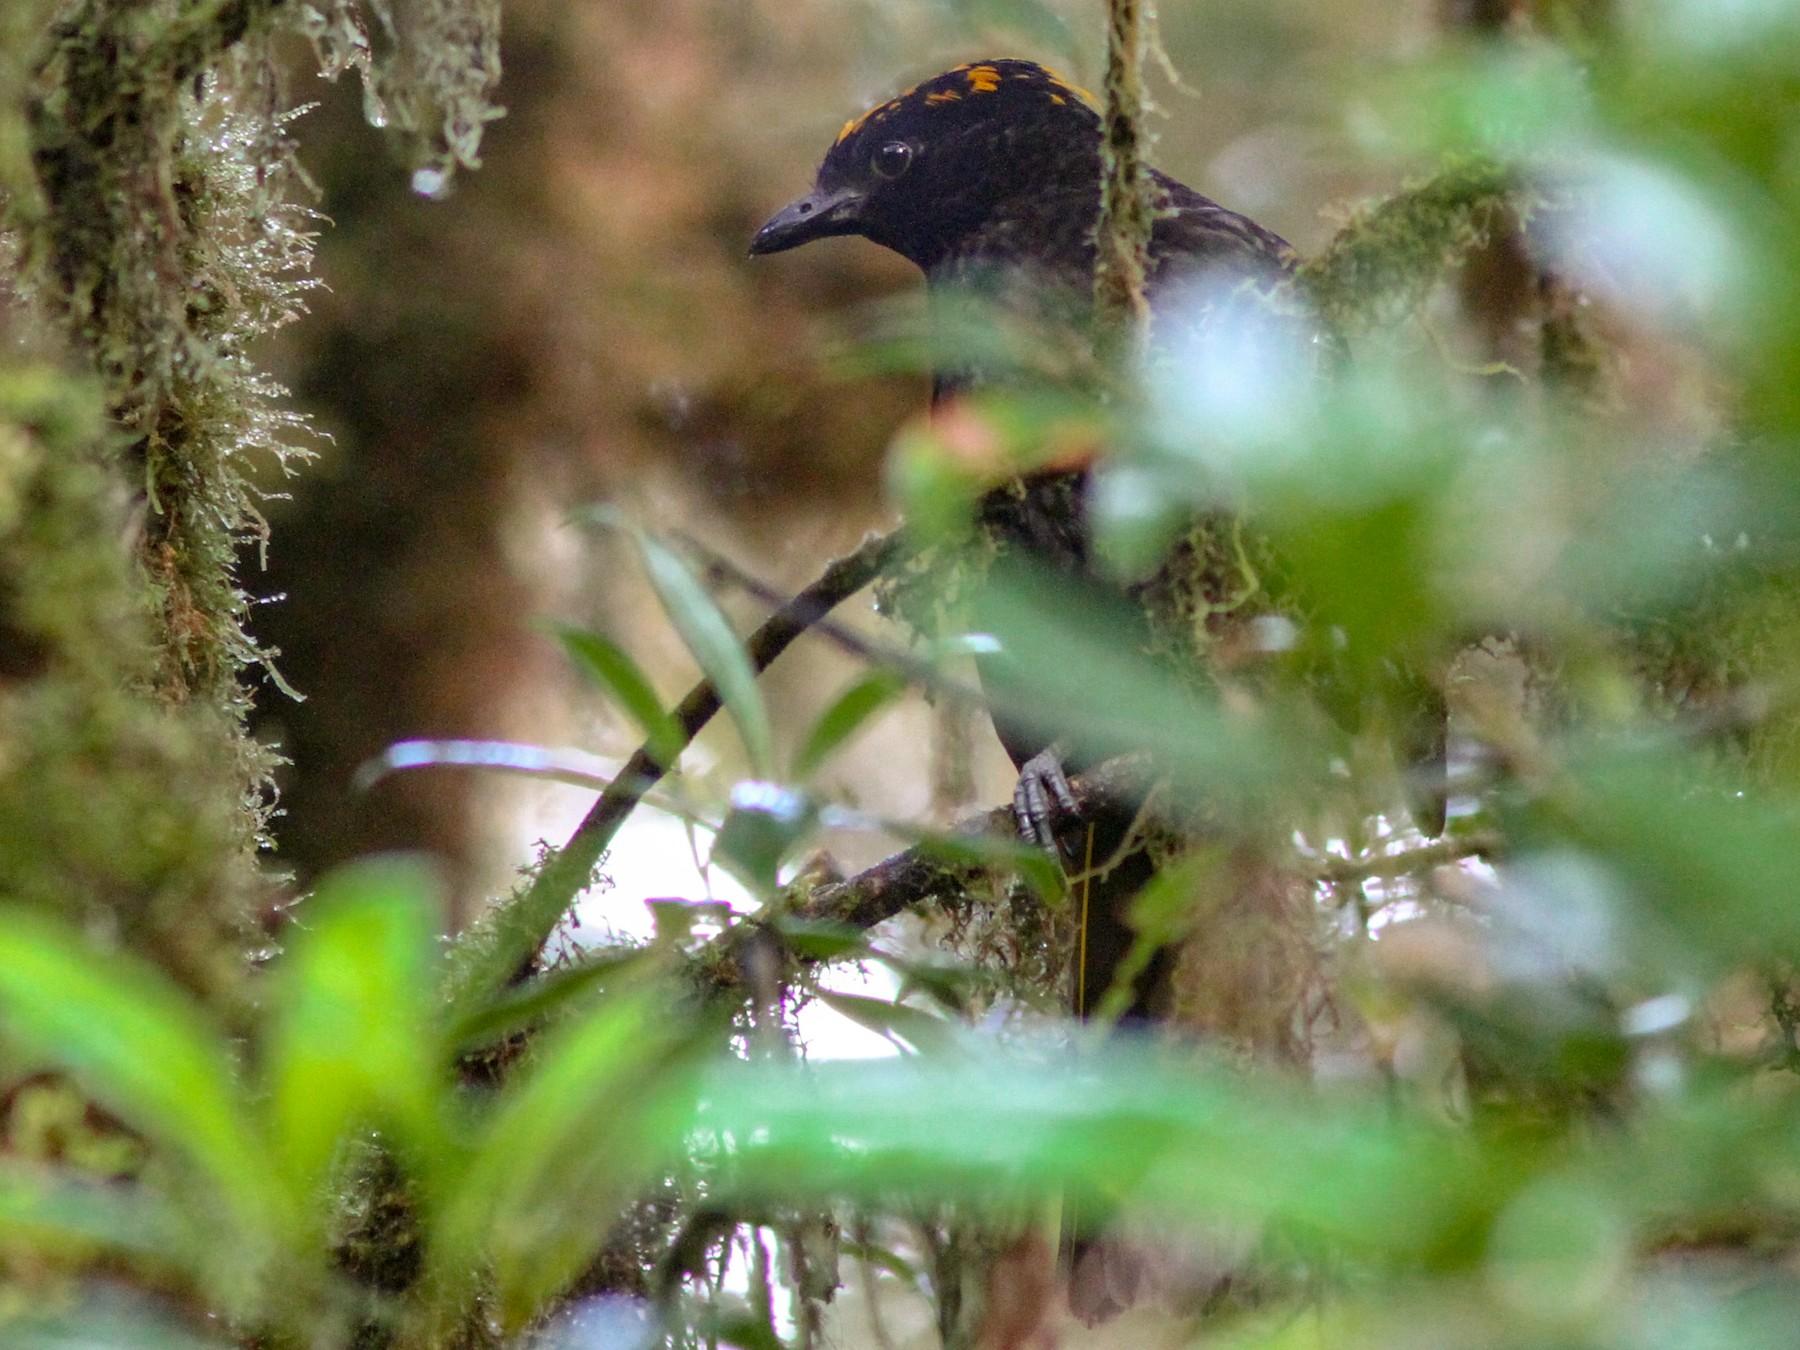 Archbold's Bowerbird - Stephan Lorenz